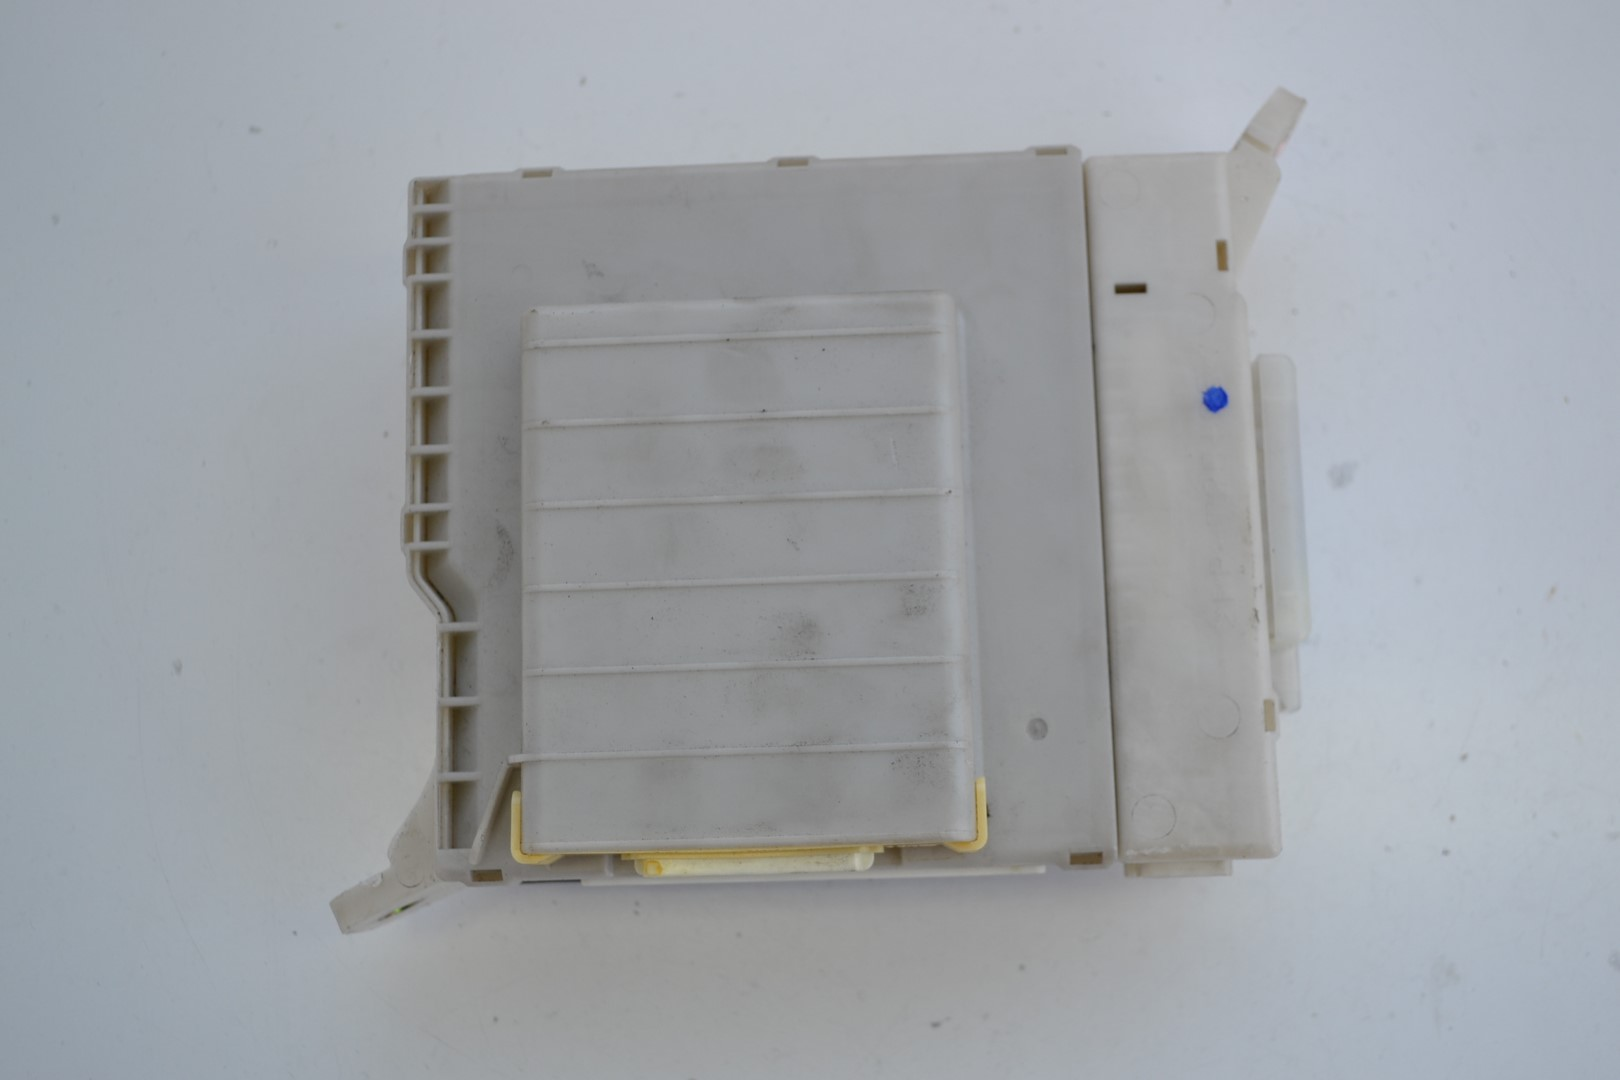 1449777 2007 lexus gs 300 gs450 fuse box relay unit module 82730 30321 ebay  at reclaimingppi.co